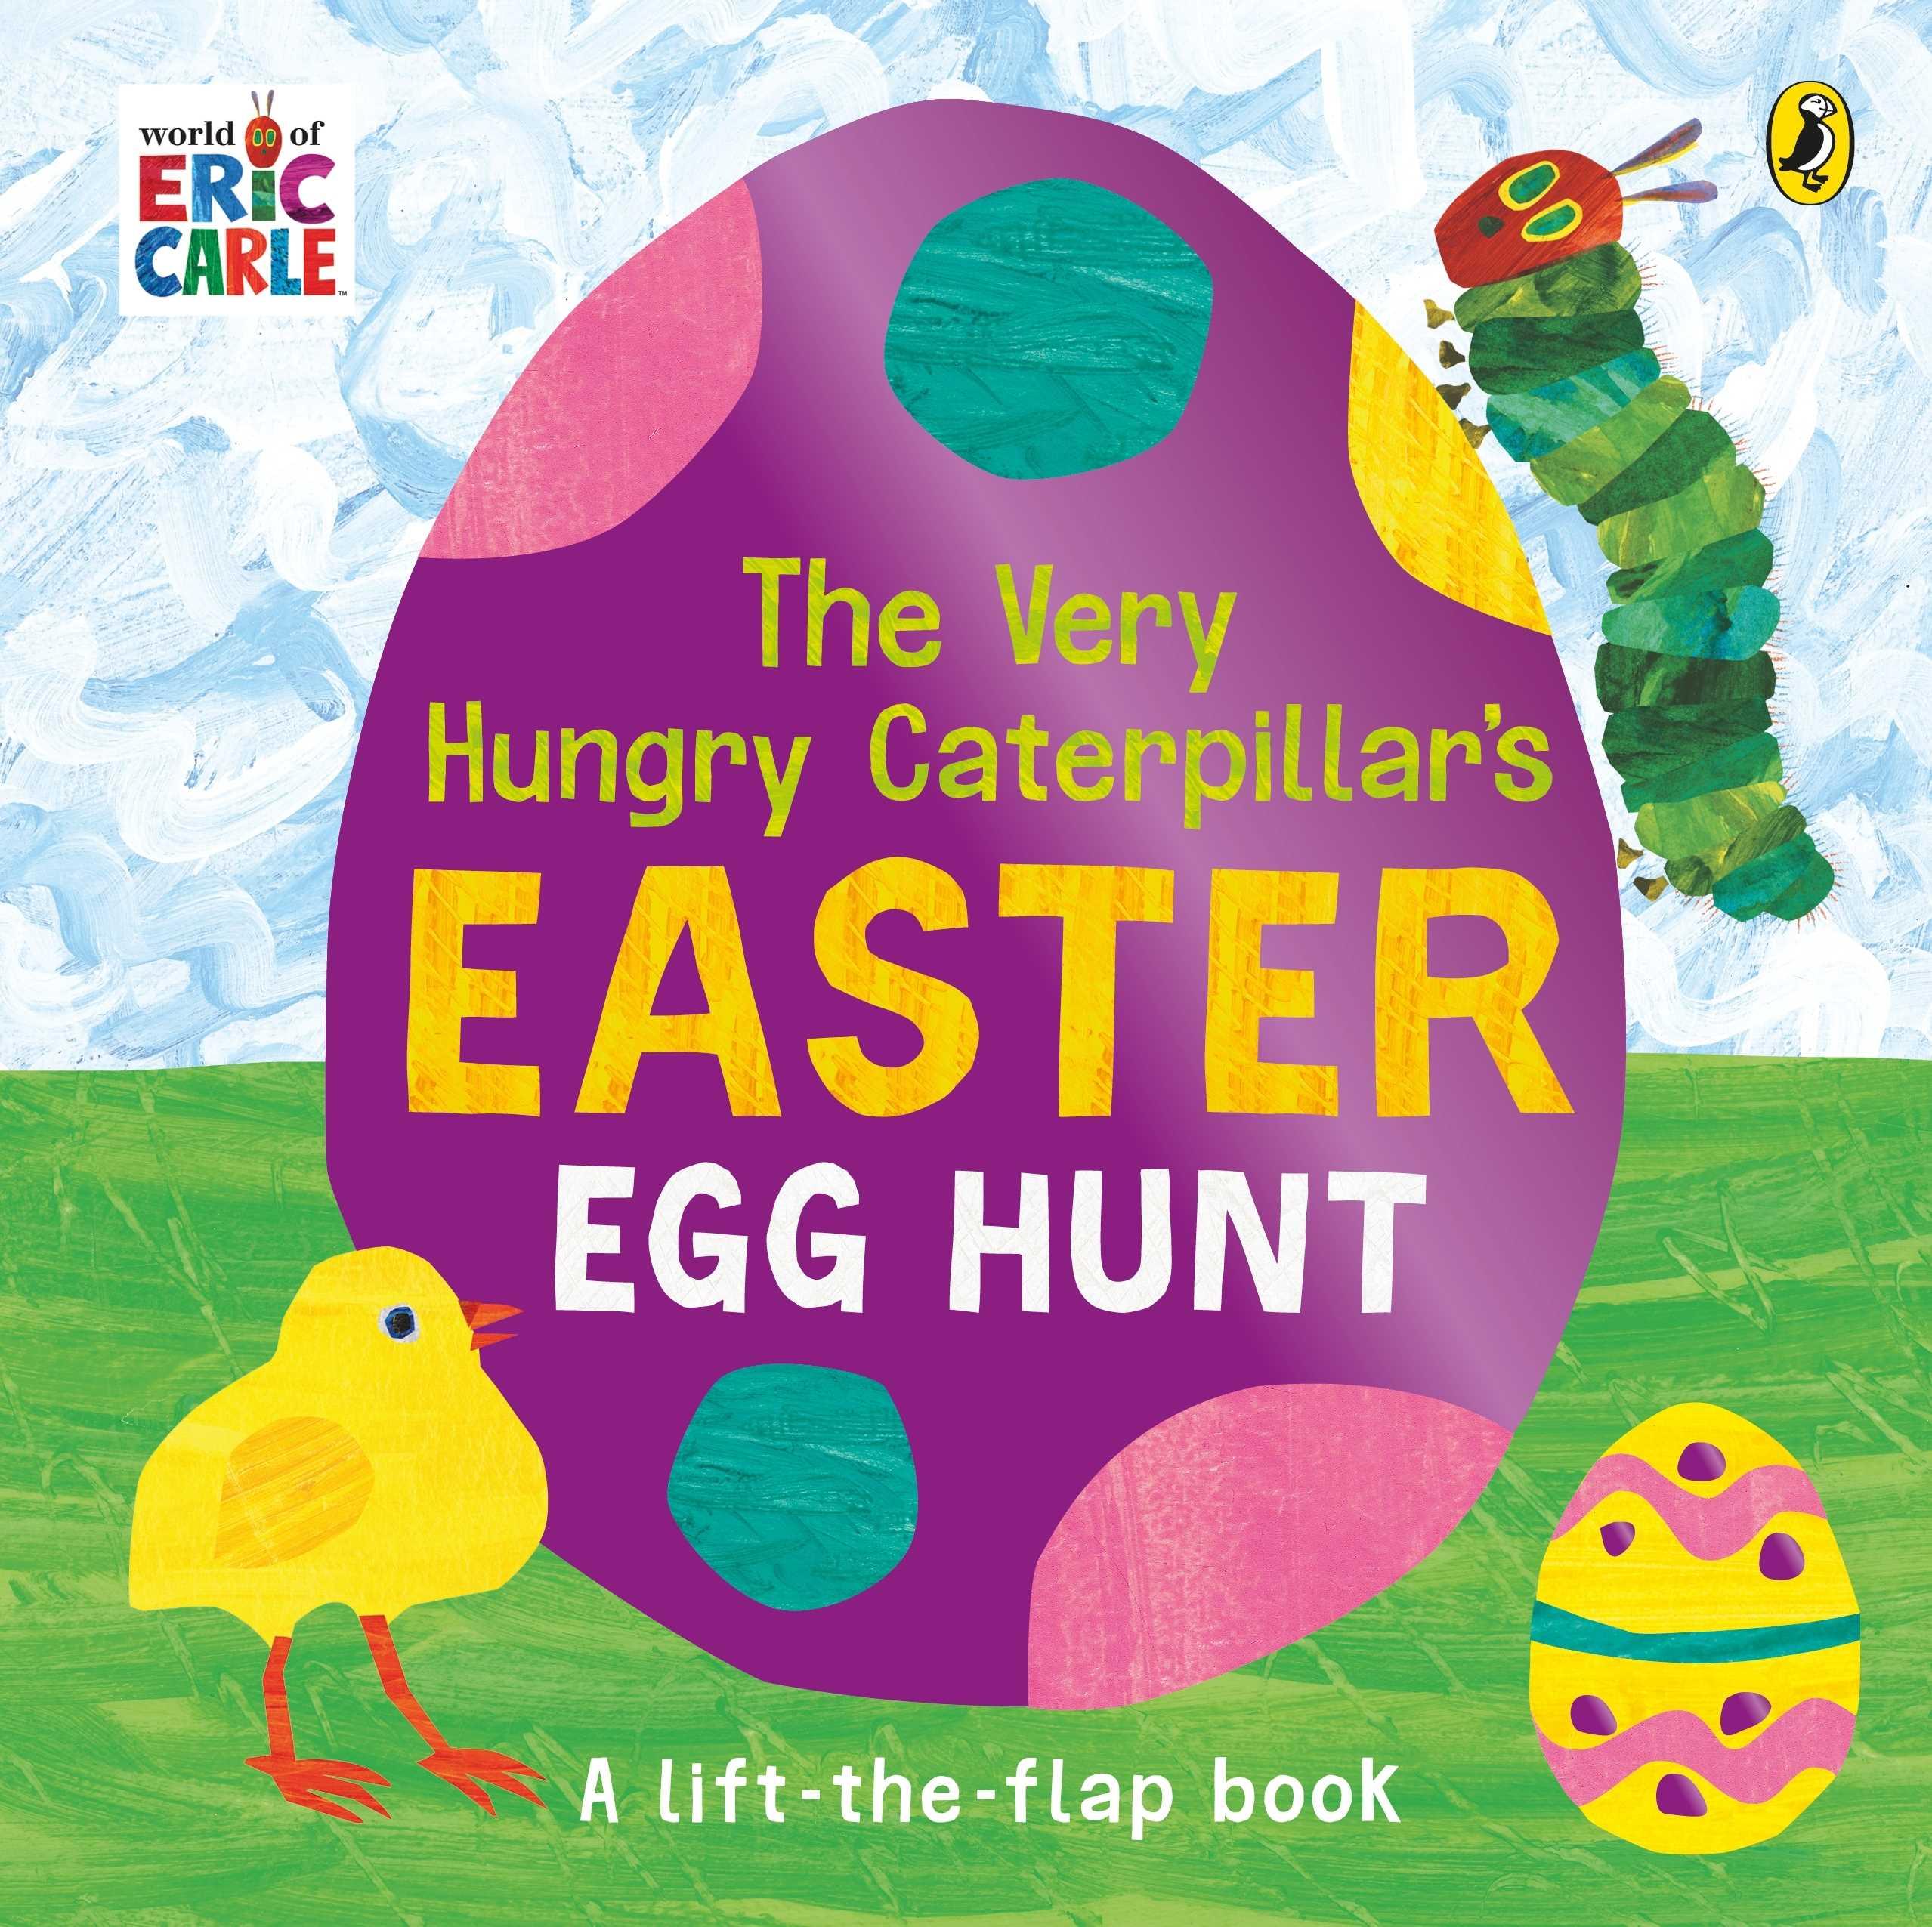 The Very Hungry Caterpillar Caterpillar's Easter